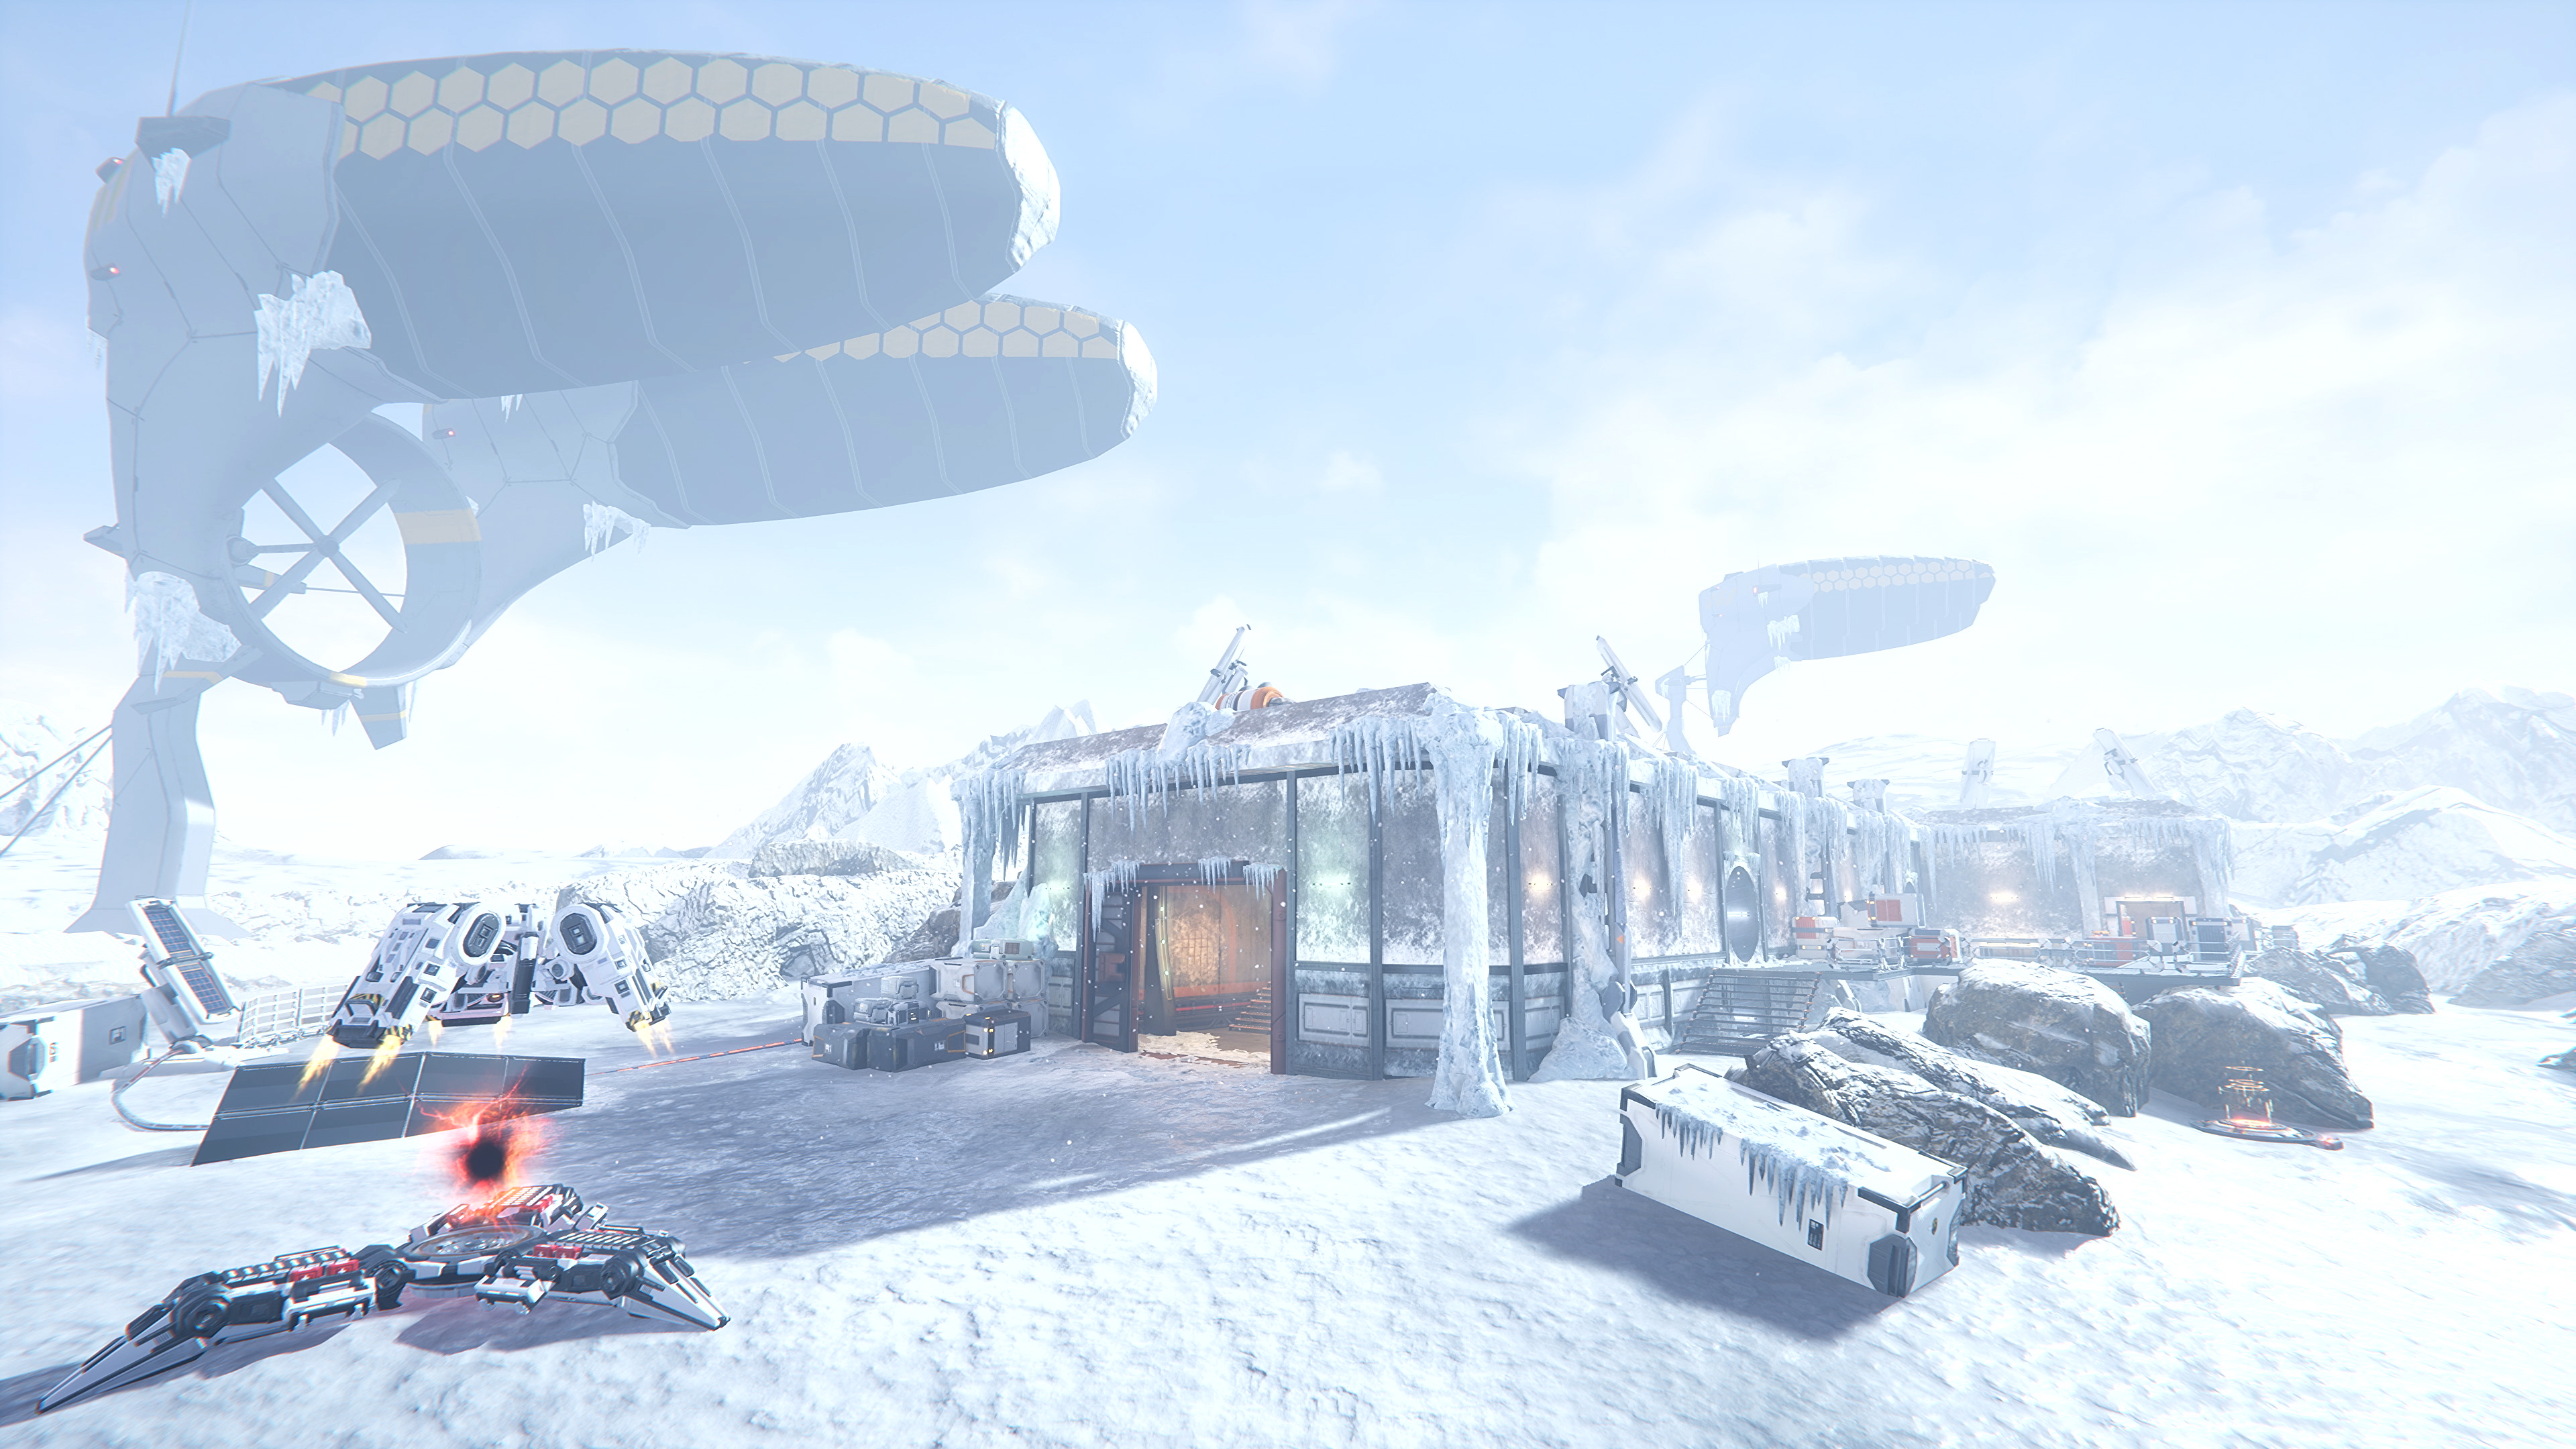 Скриншот №1 к Lemnis Gate PS4 and PS5